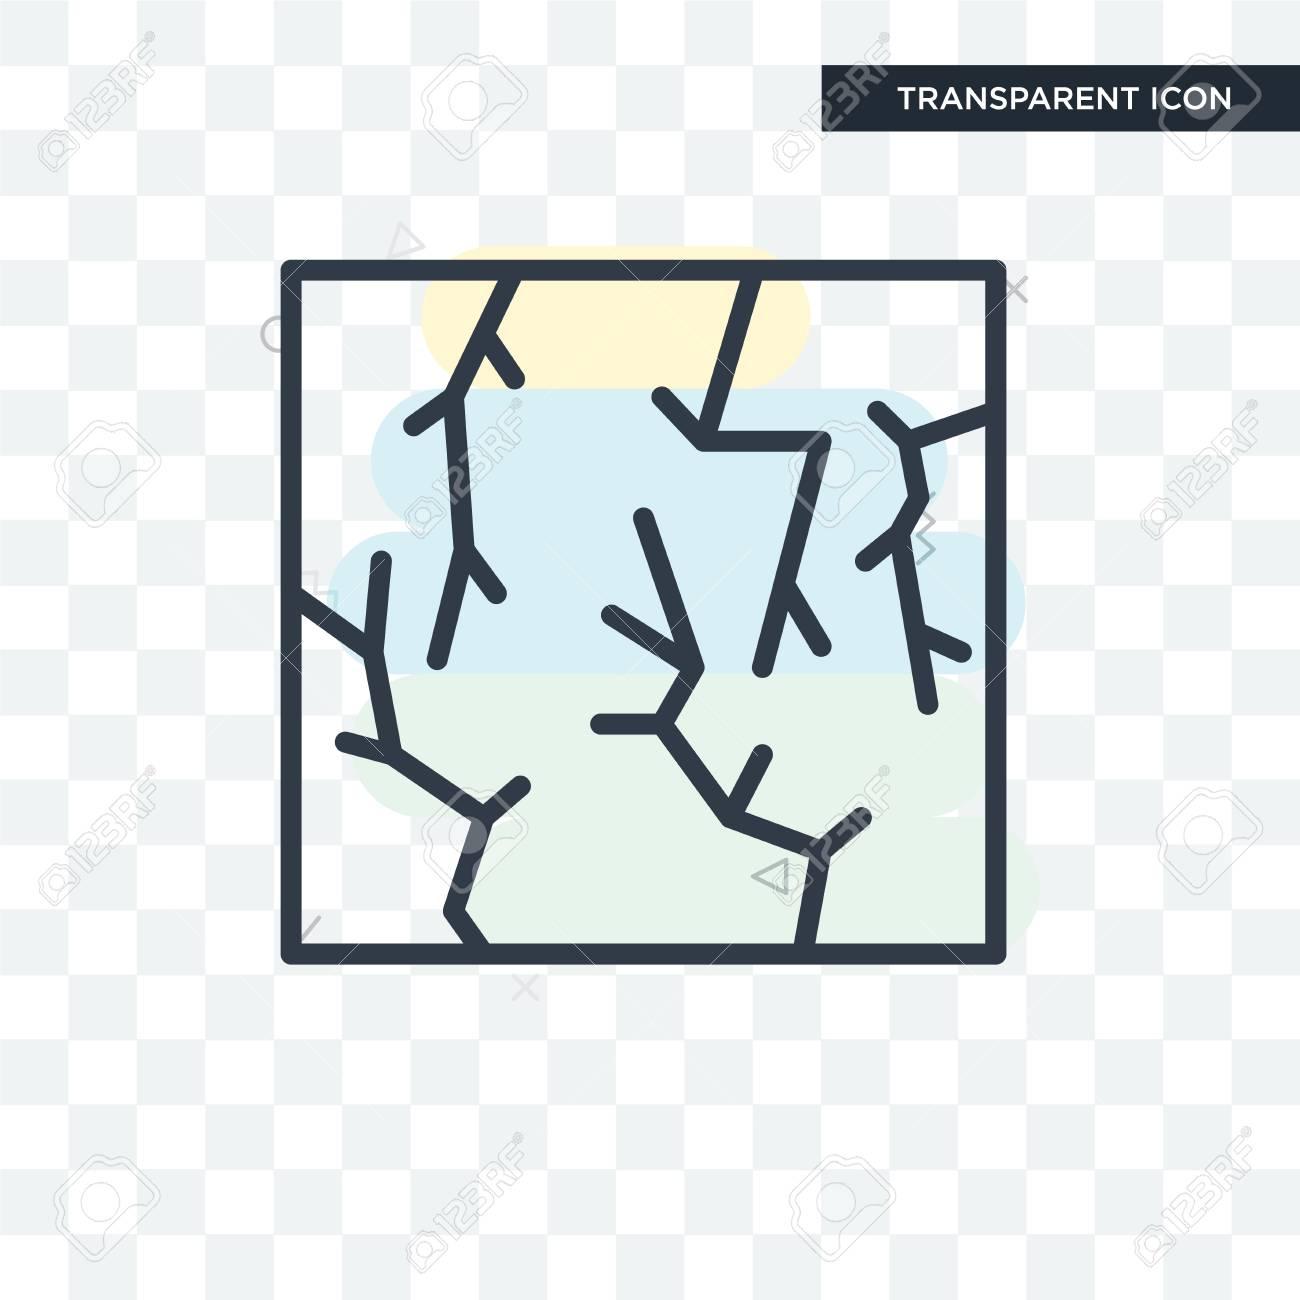 Crack icon isolated on transparent background - 108517963